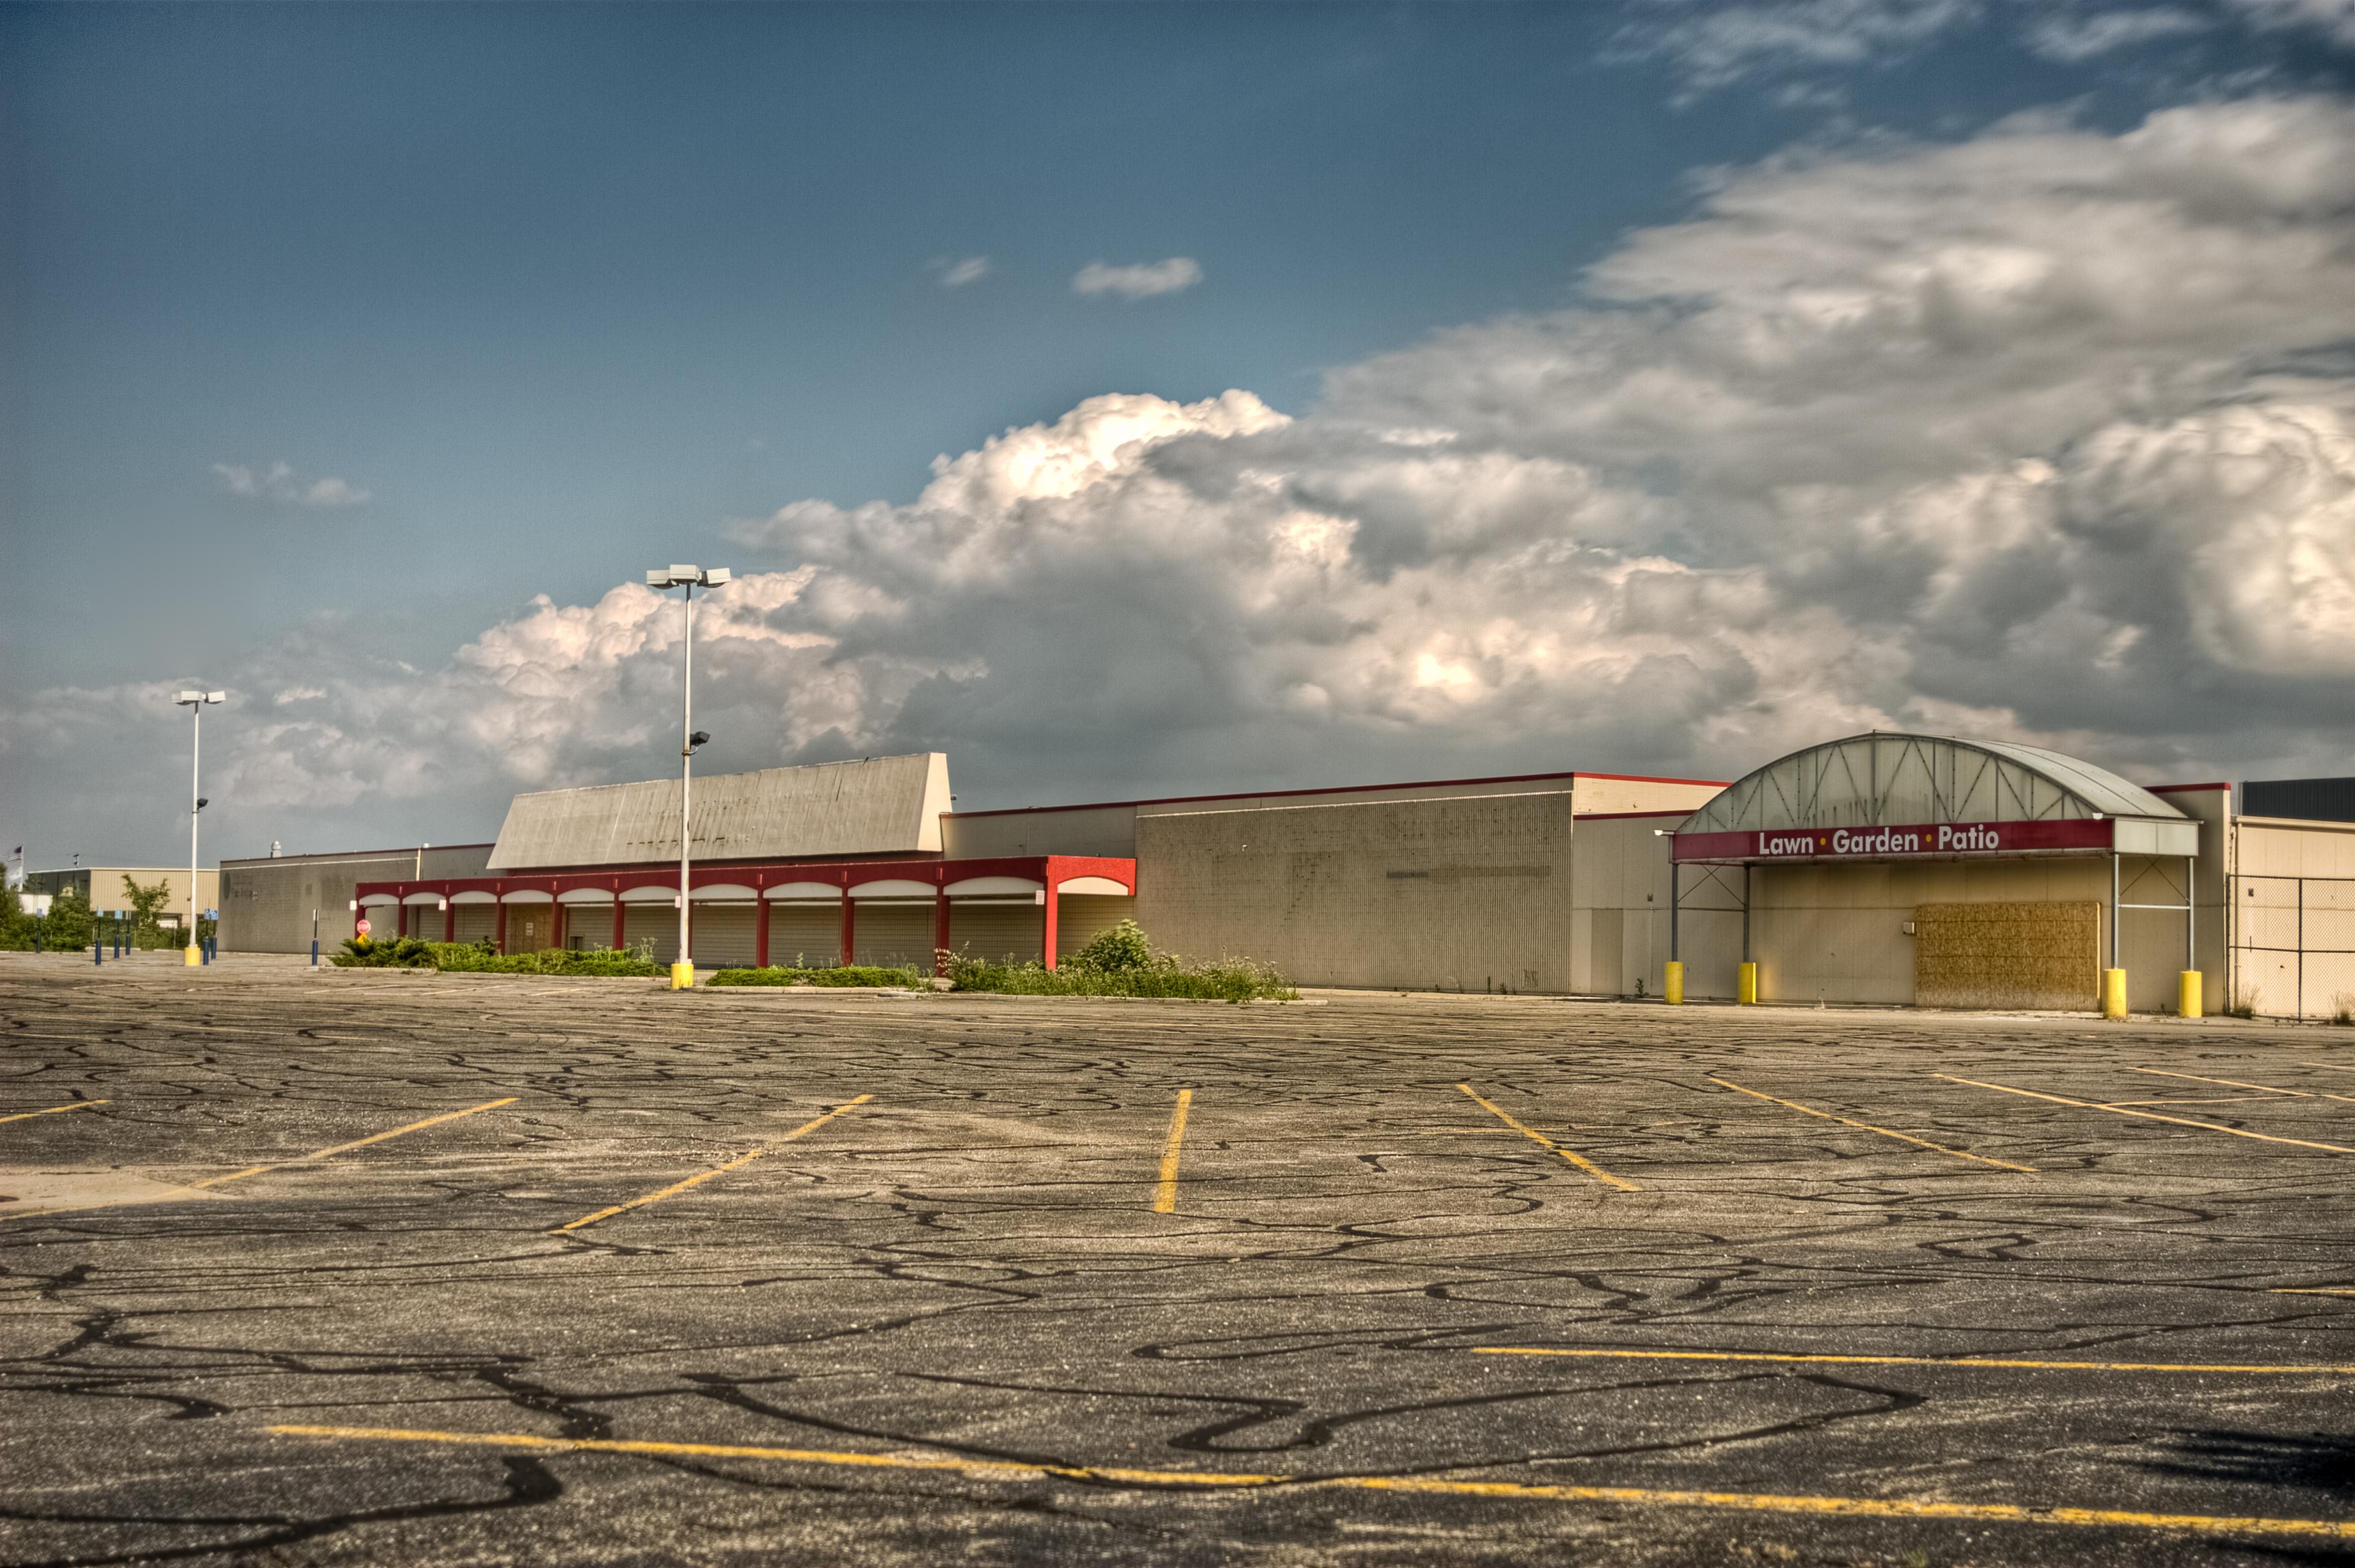 Abadoned shopping center